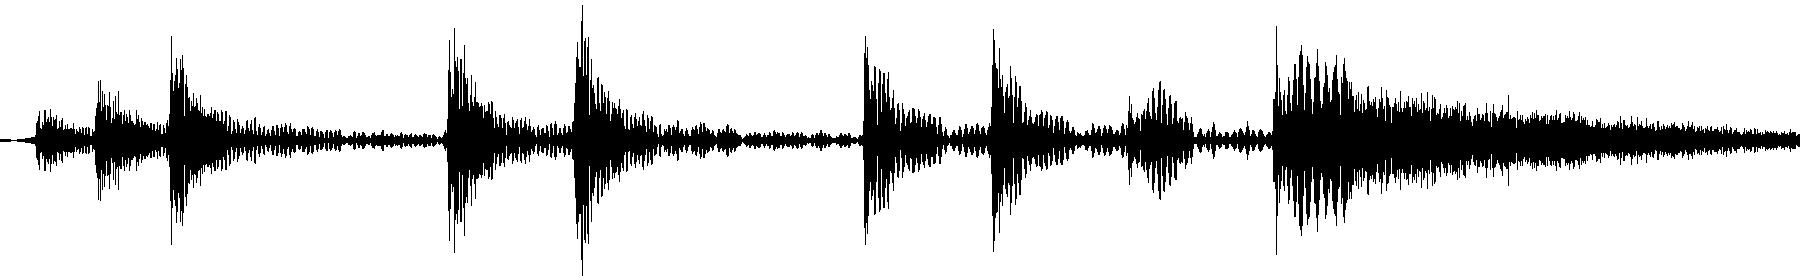 Aretha Franklin disco drum fill | Sample Focus